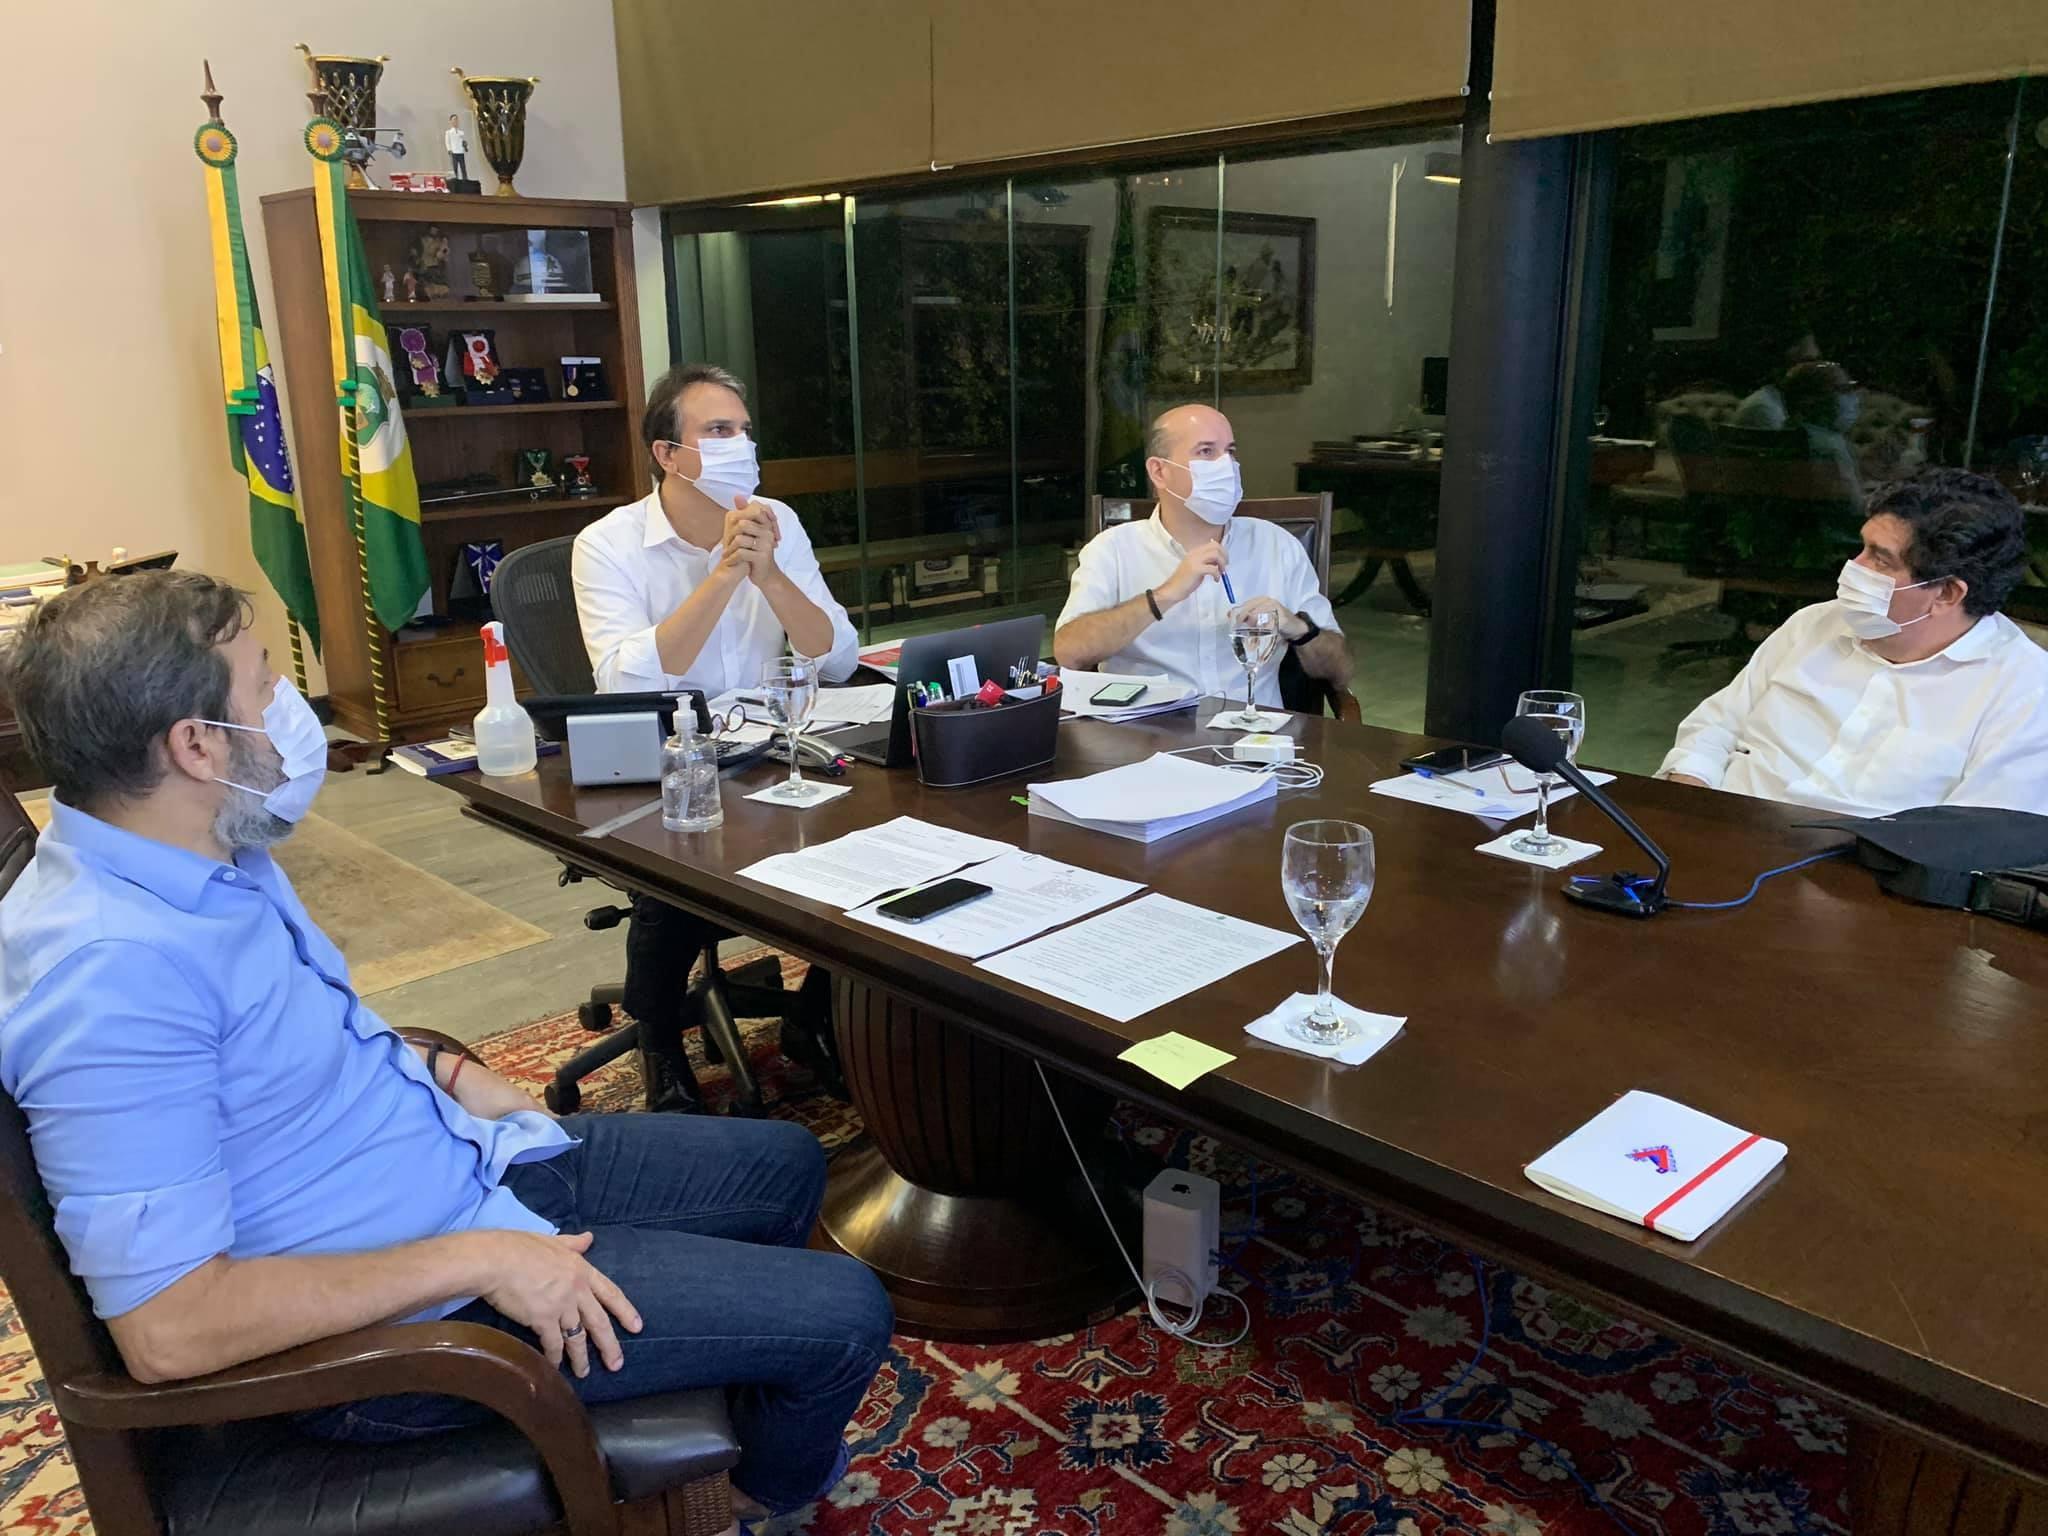 Camilo Santana anuncia decreto de isolamento social para o Ceará mais rigoroso nesta terça-feira